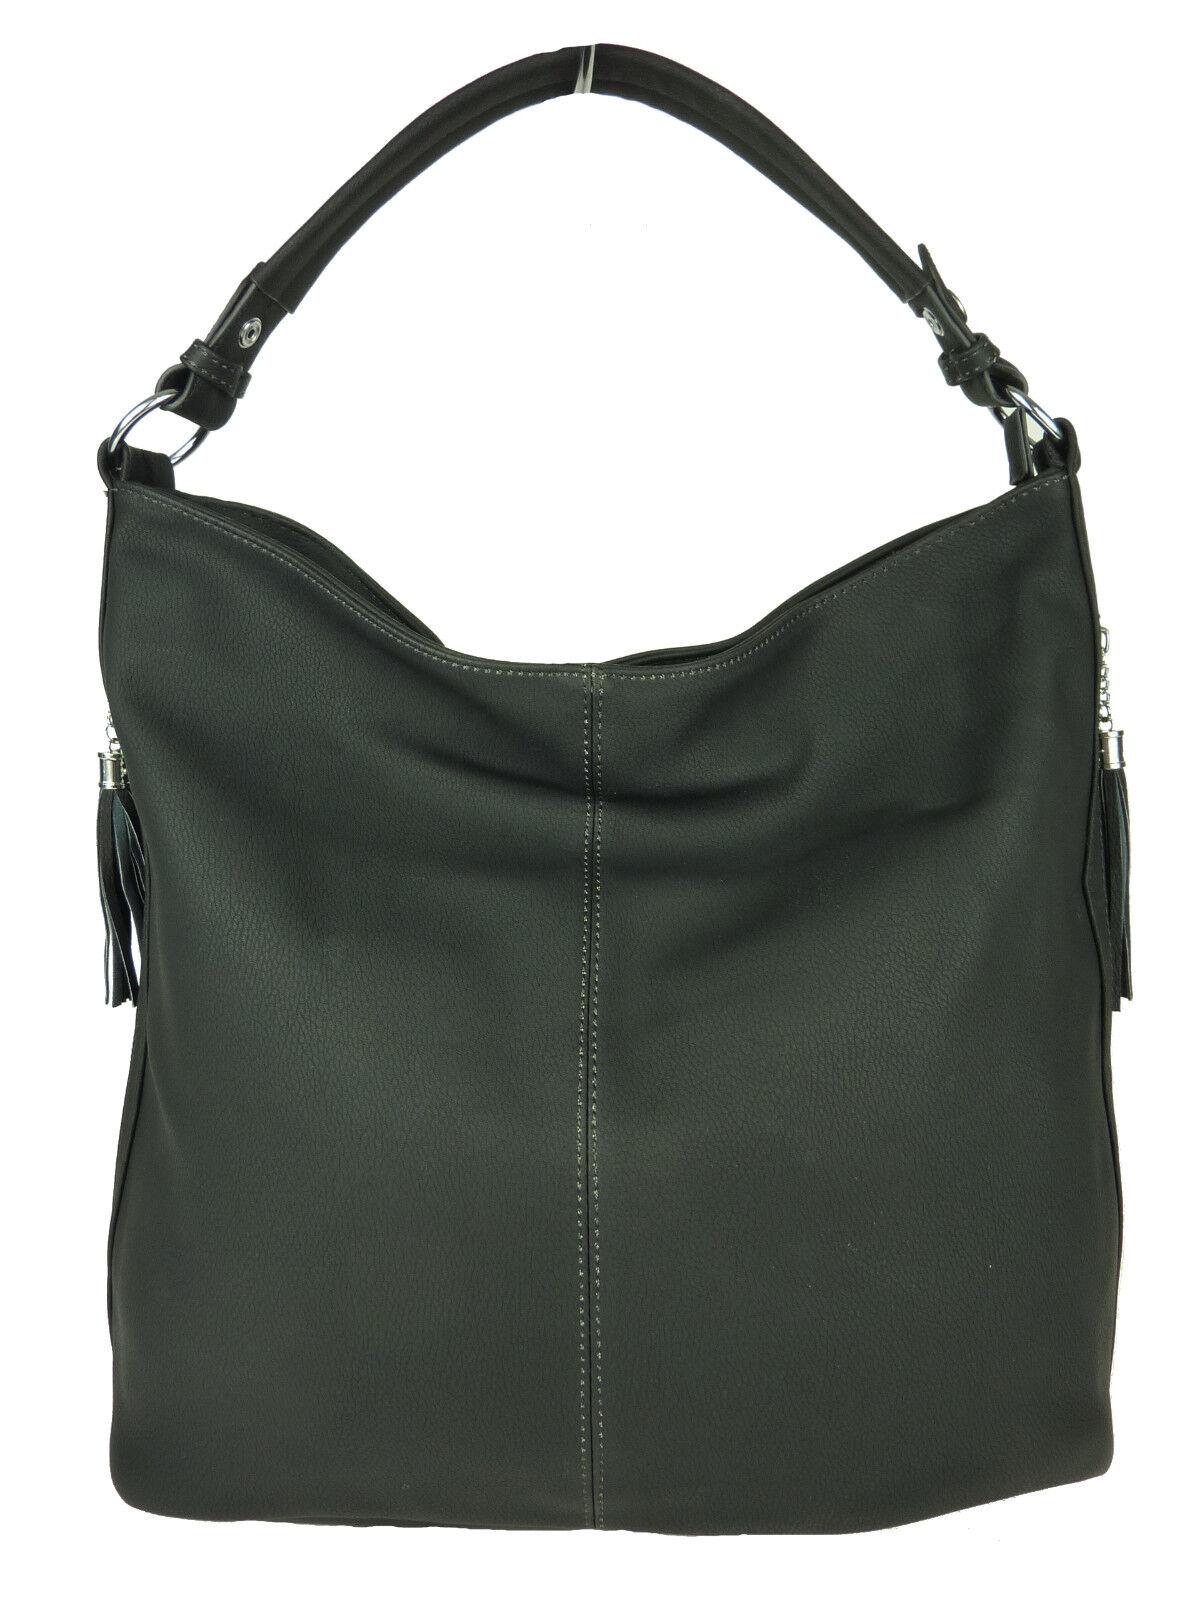 ELLA große Shopper Tasche Leder optik uni Handtasche Tote bag Schultasche 8348